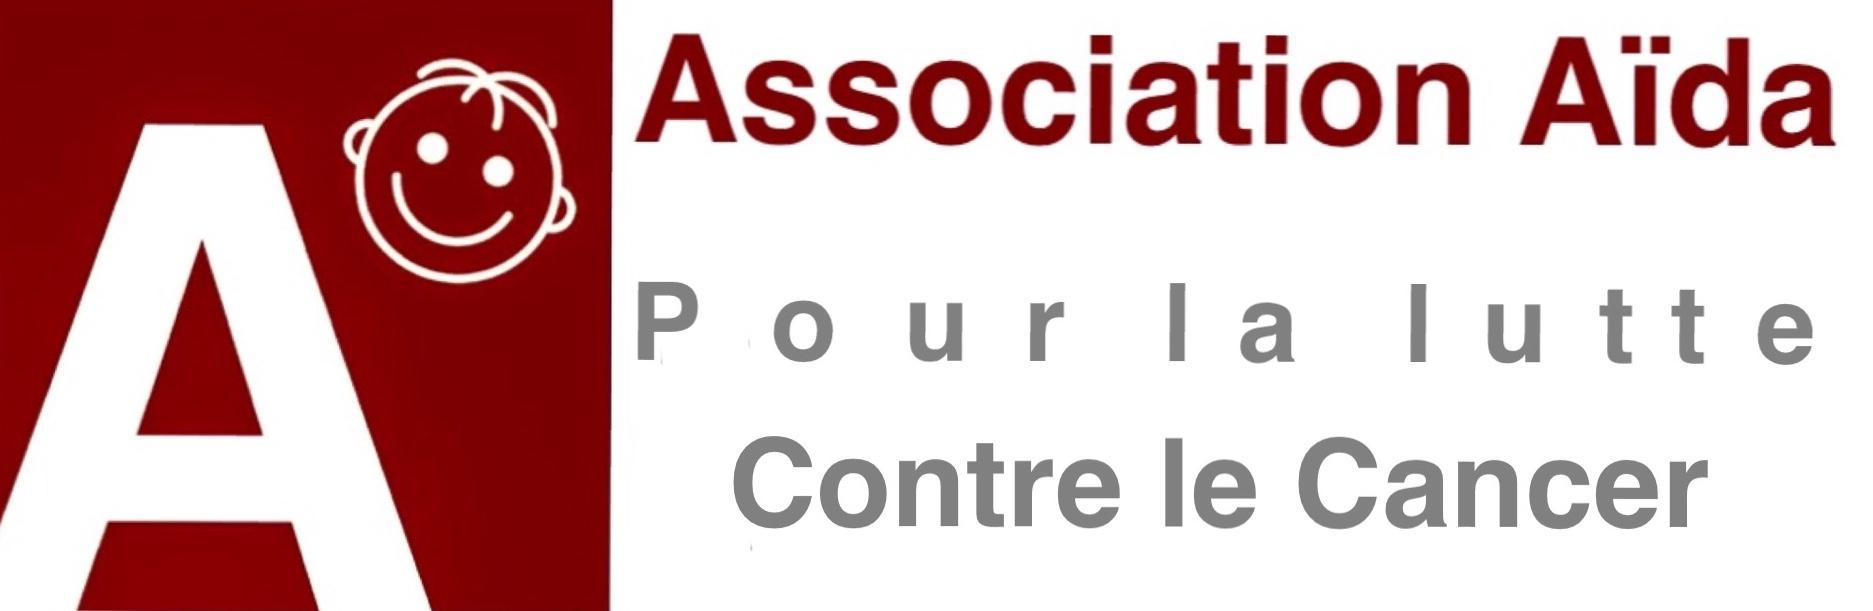 La Collecte de Léa Moukanas - Course de Neuilly Sur Seine - Association Aïda